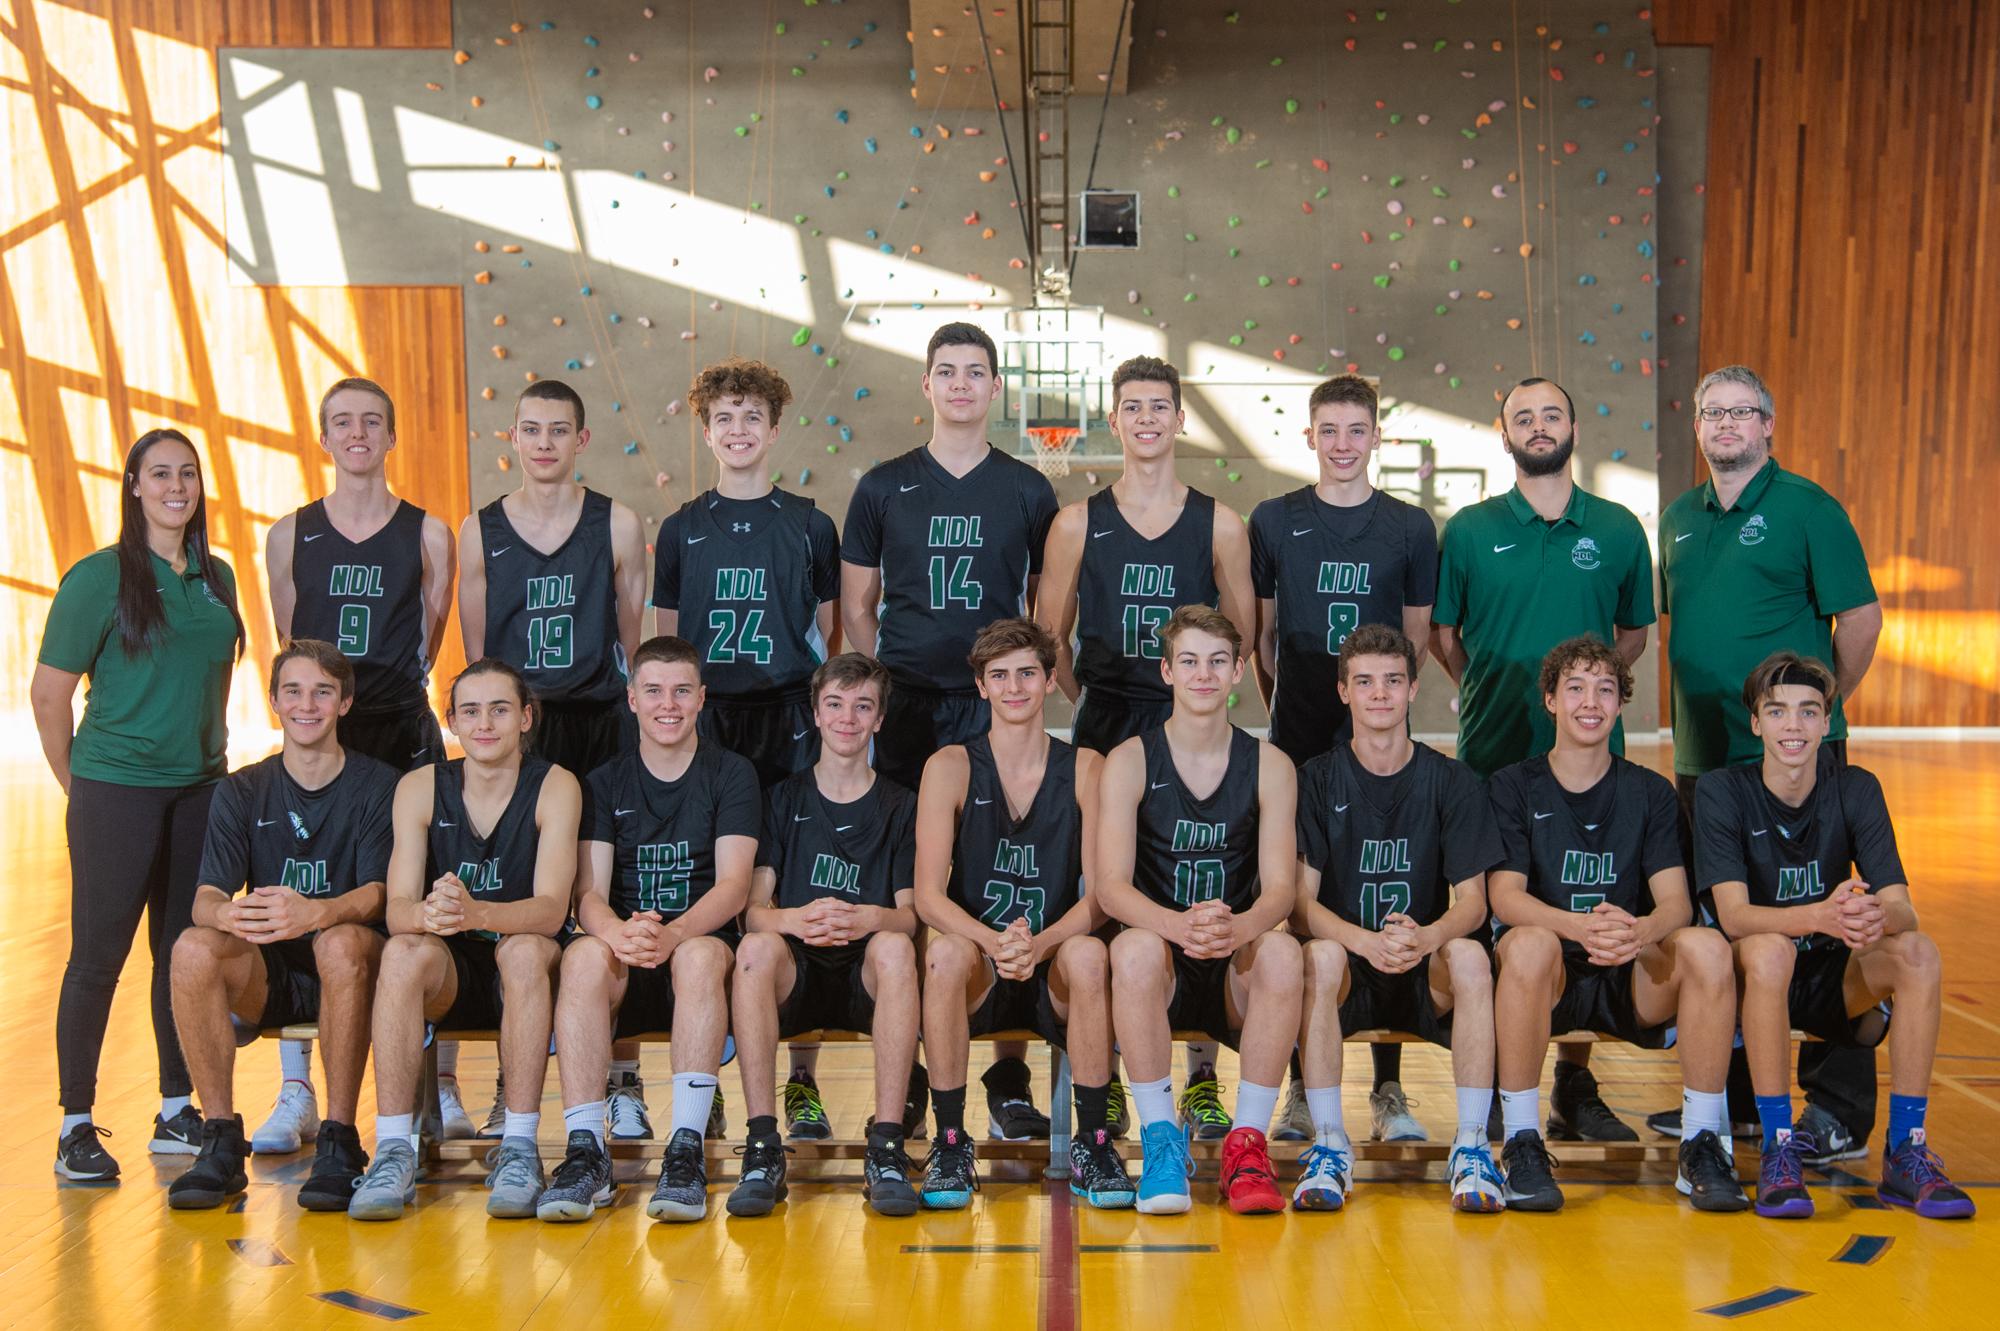 NDL_Preds 2019-2020 Basket JMD1